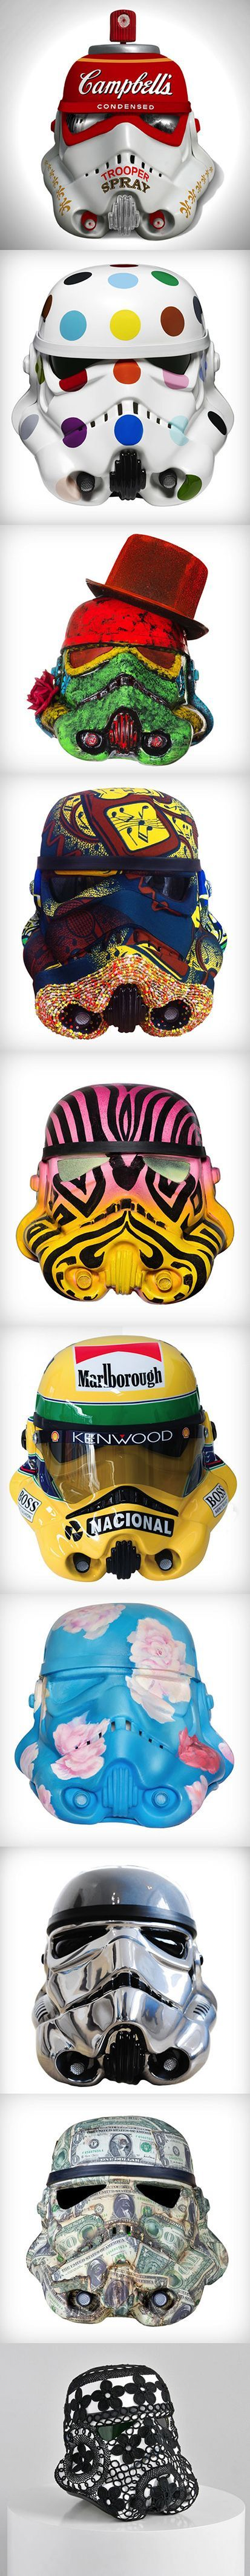 Art Wars: Famous Artists Remix the Famous Star Wars Storm Trooper Helmet (Coming to the London Underground) Read more at http://www.visualnews.com/2013/10/15/art-wars-famous-artists-remix-famous-star-wars-storm-trooper-helmet/#lP2TkzEjE3vZ9SI5.99: